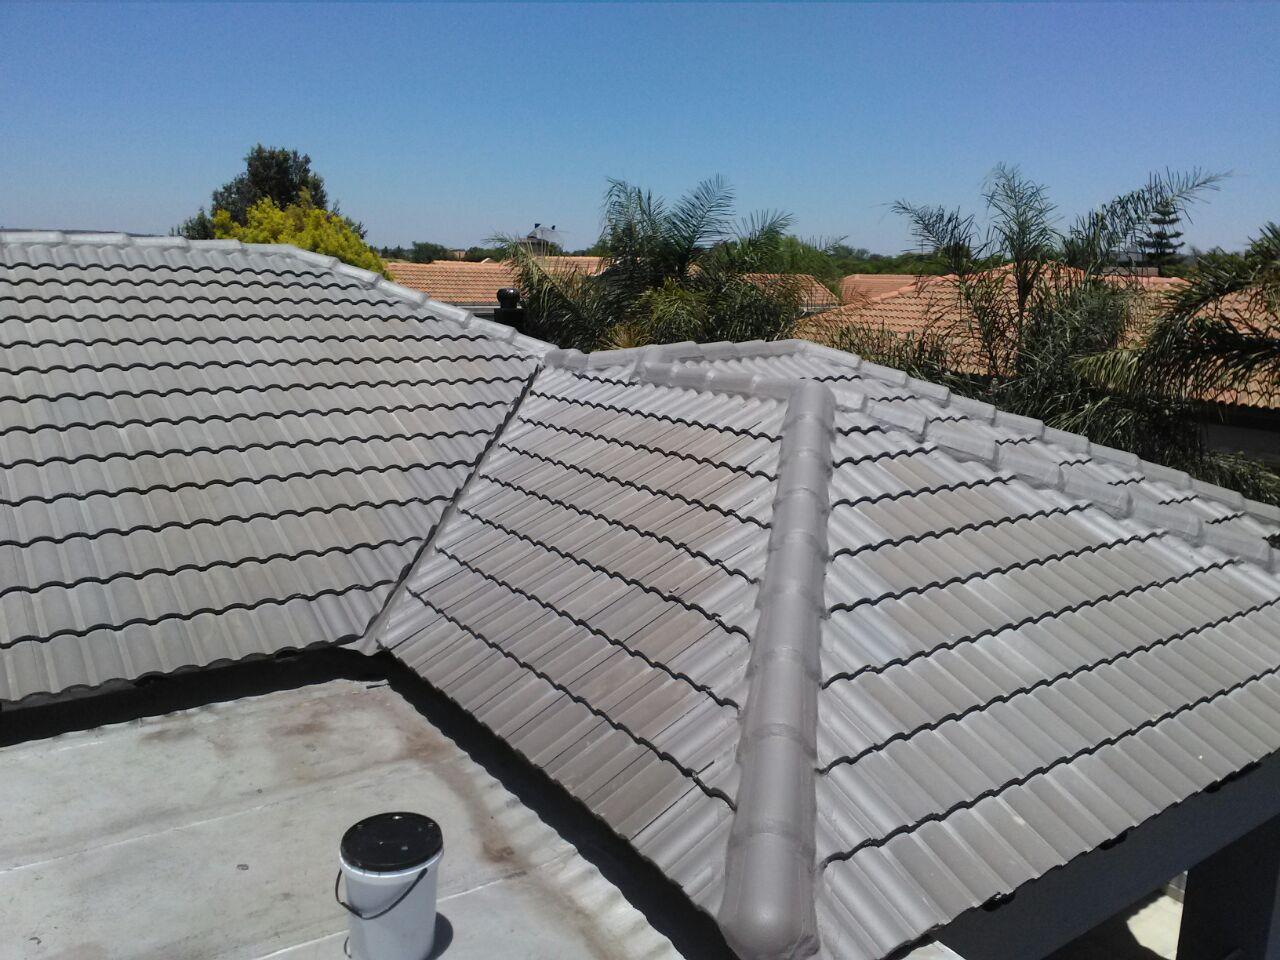 Waterproofing of tile roof valleys and hips